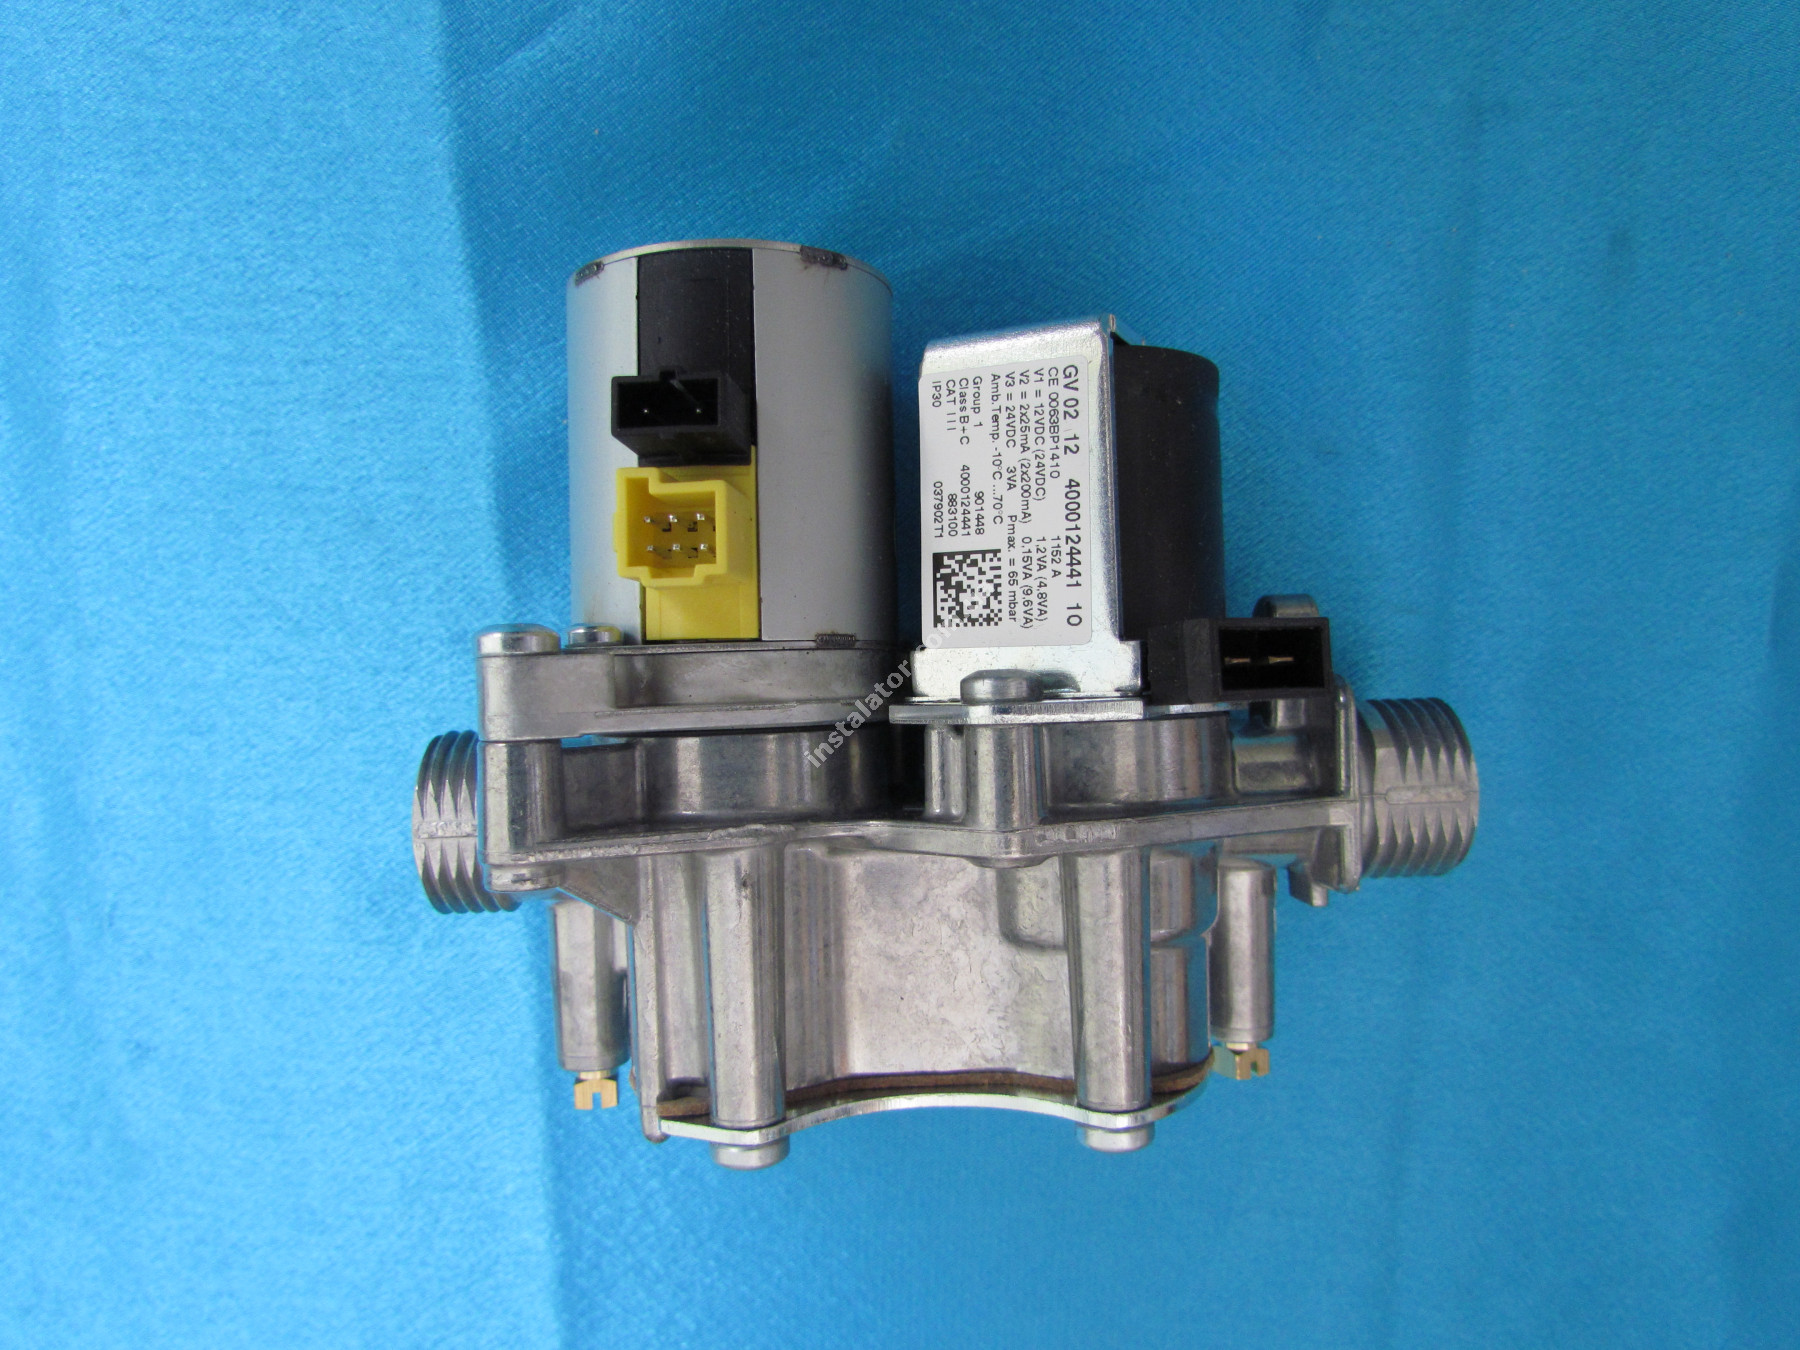 0020019991 Газовый клапан VAILLANT atmoTEC Pro / turboTEC Pro full-image-2